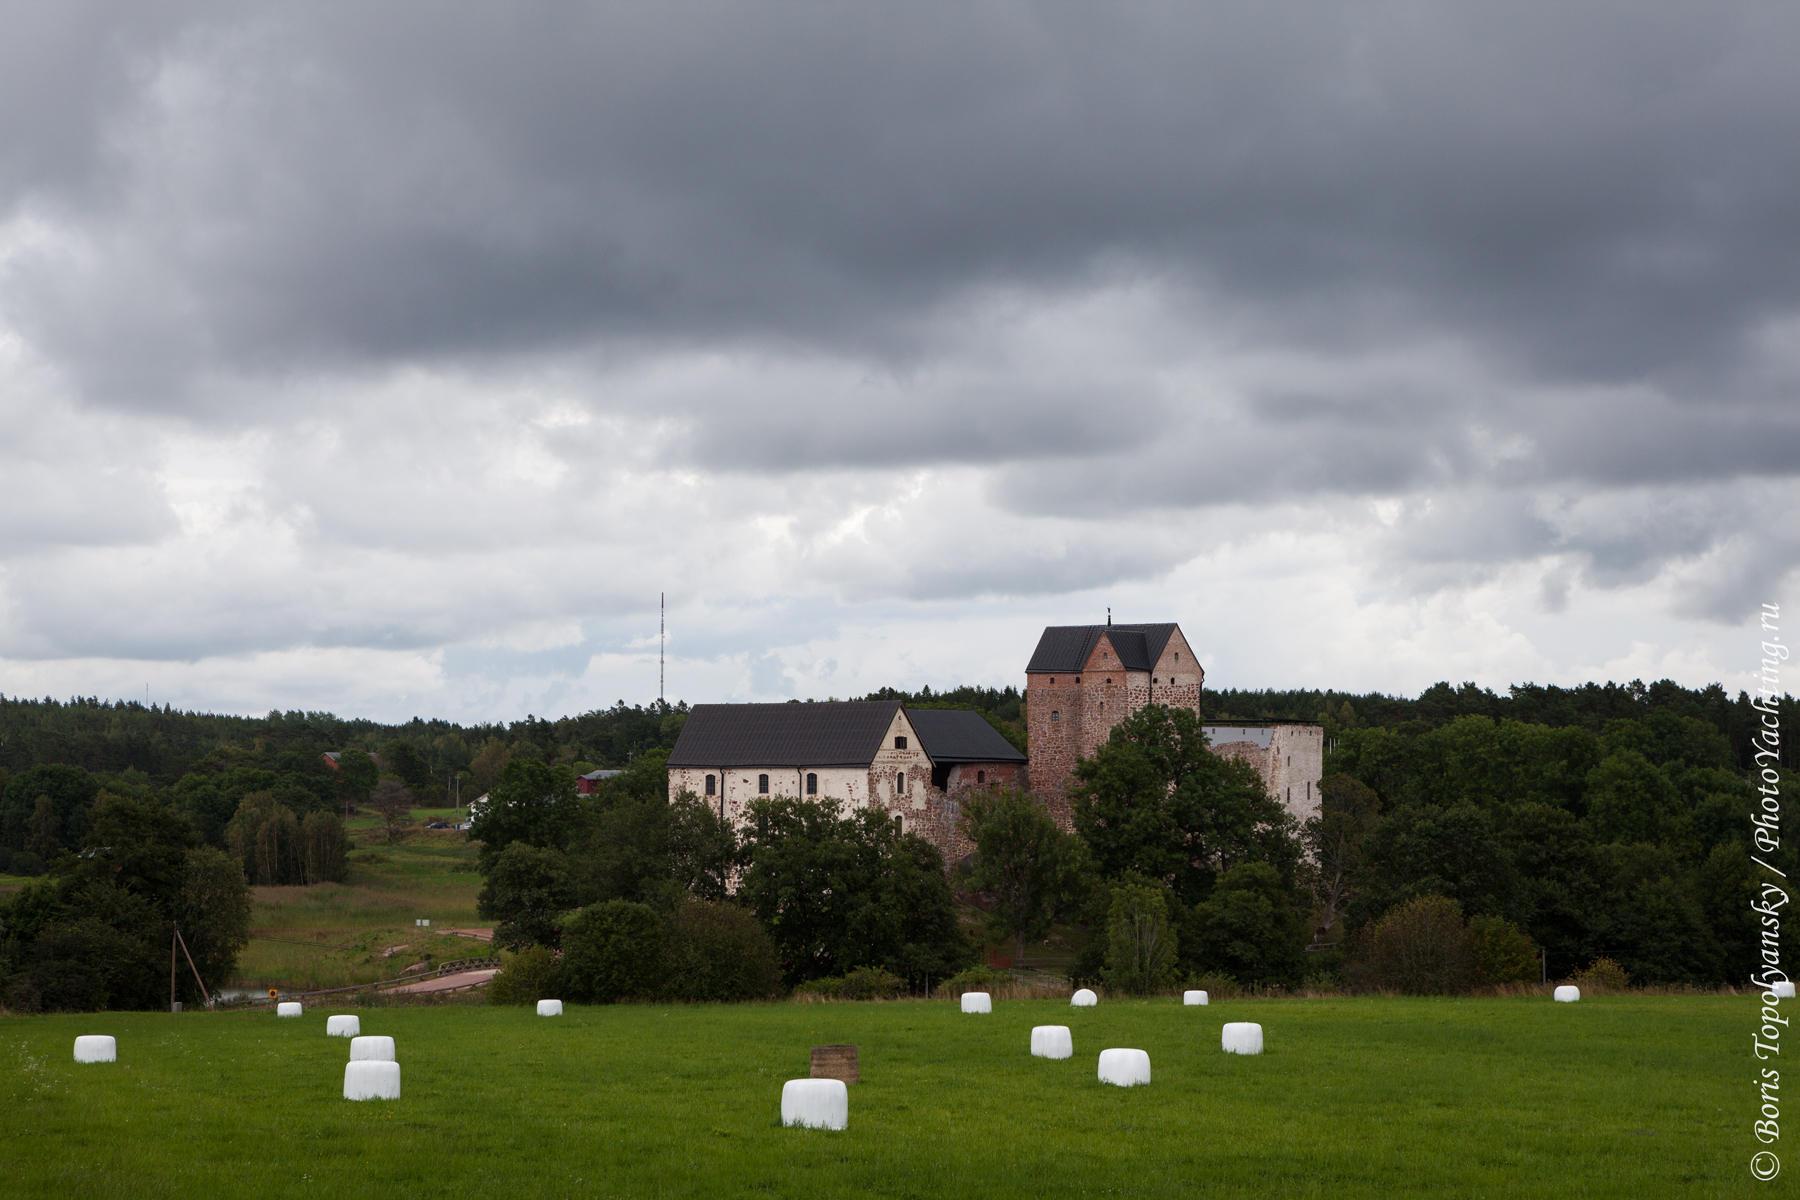 Кастельхольм, Kastelholm